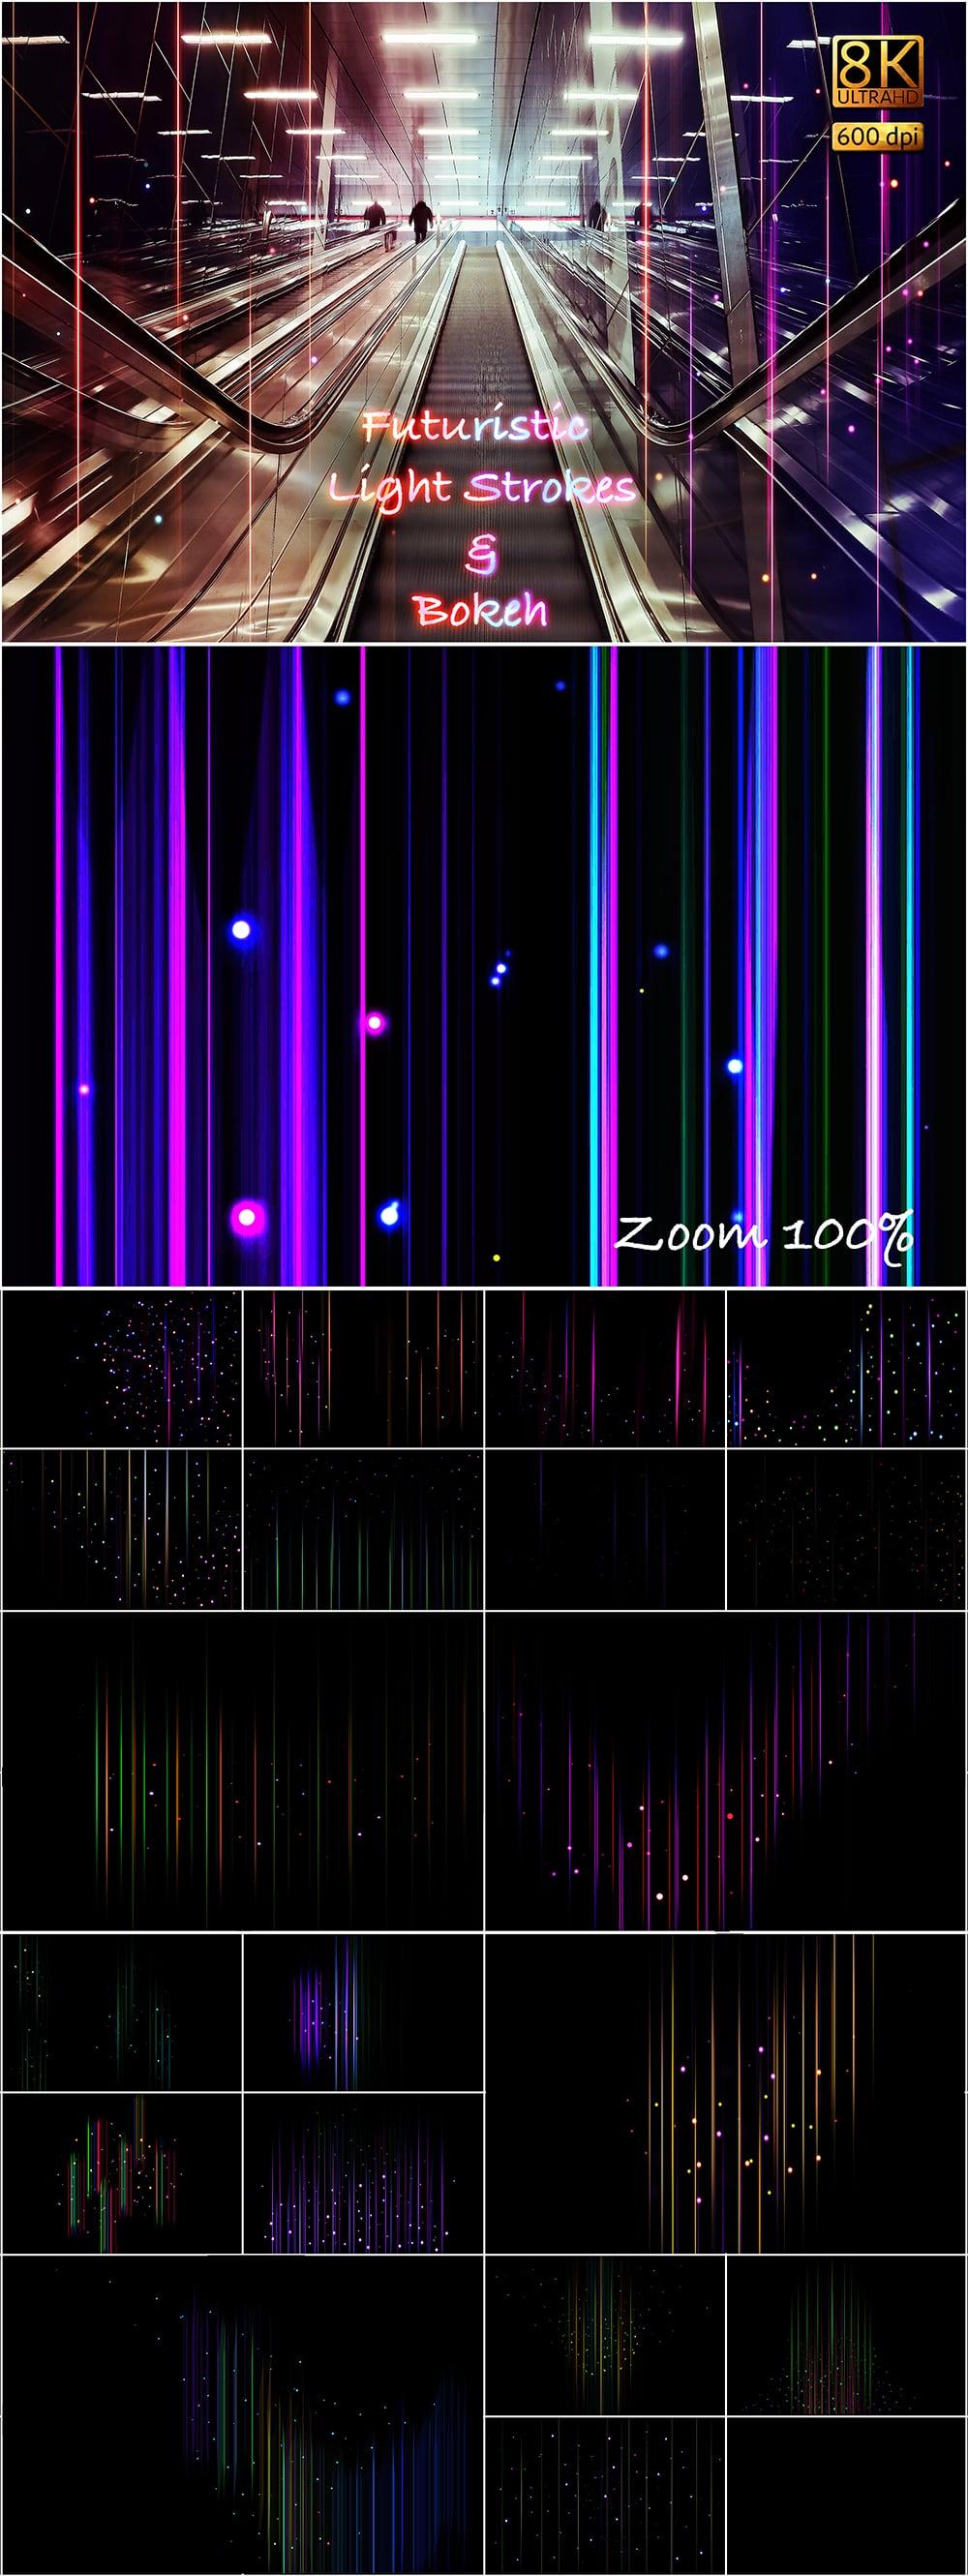 130 Professional Overlays - Futuristic Light Strokes Bokeh